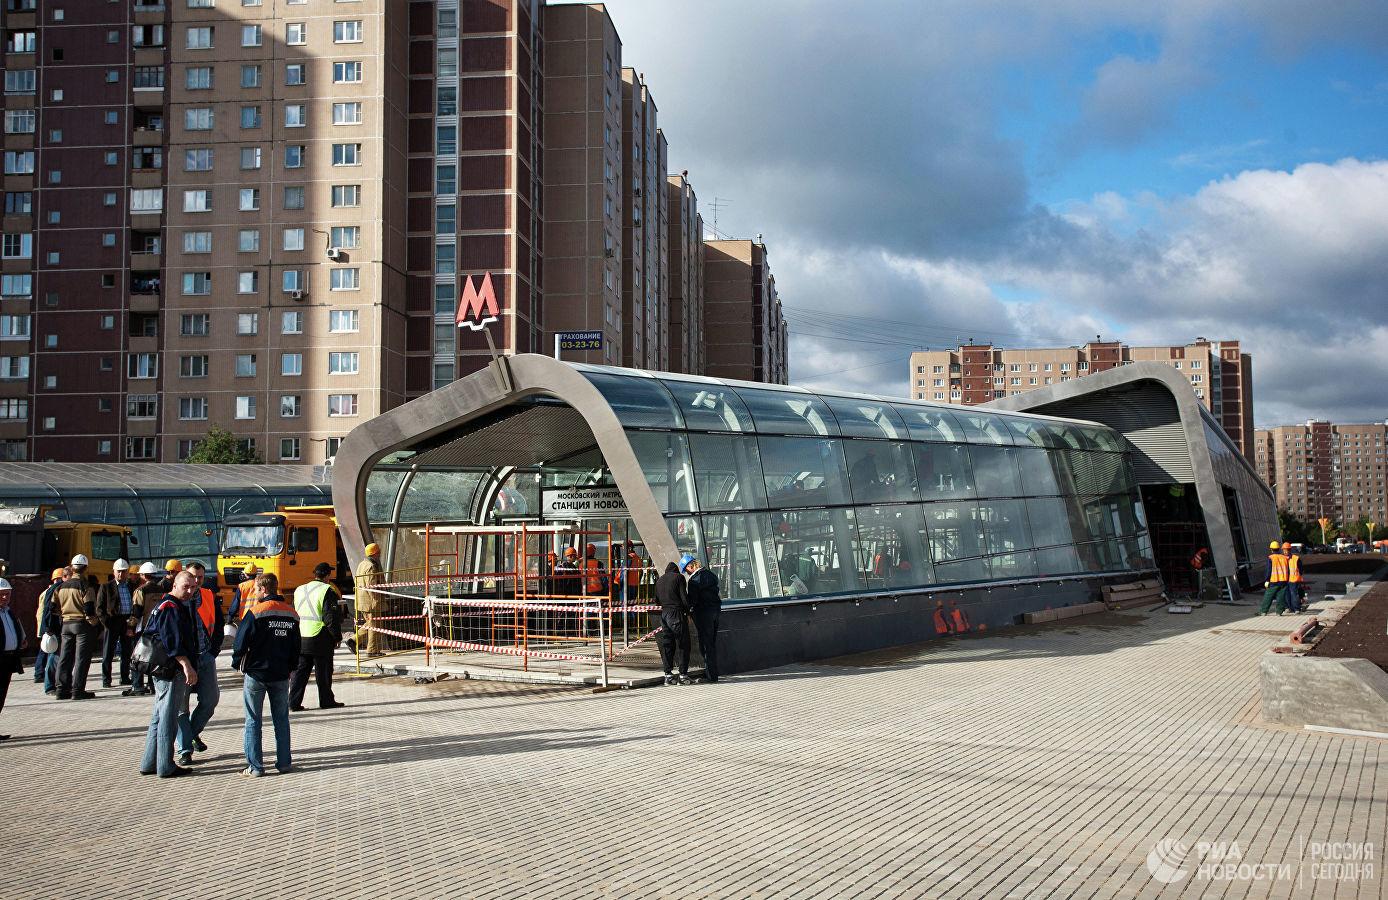 маунтин перебежал картинки возле метро компания подтвердила